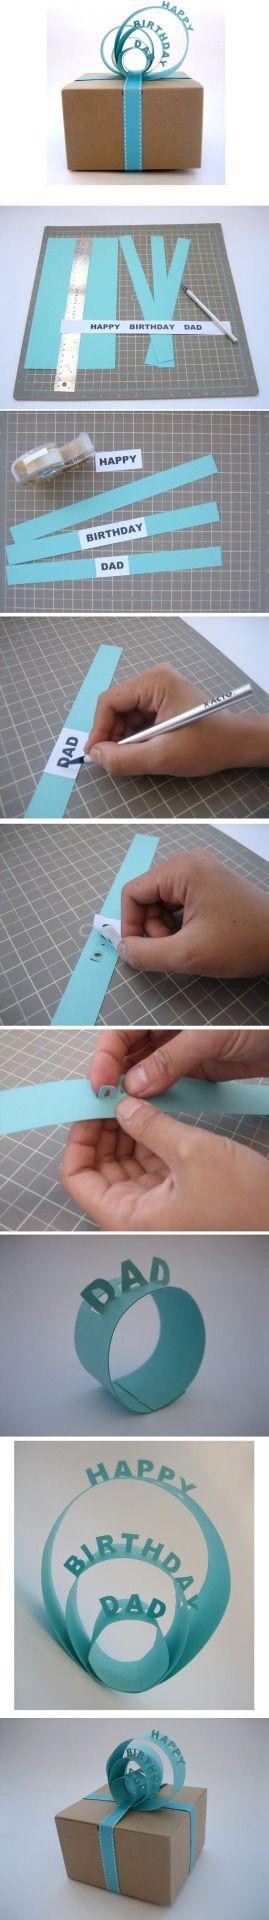 DIY Paper Gift Topper